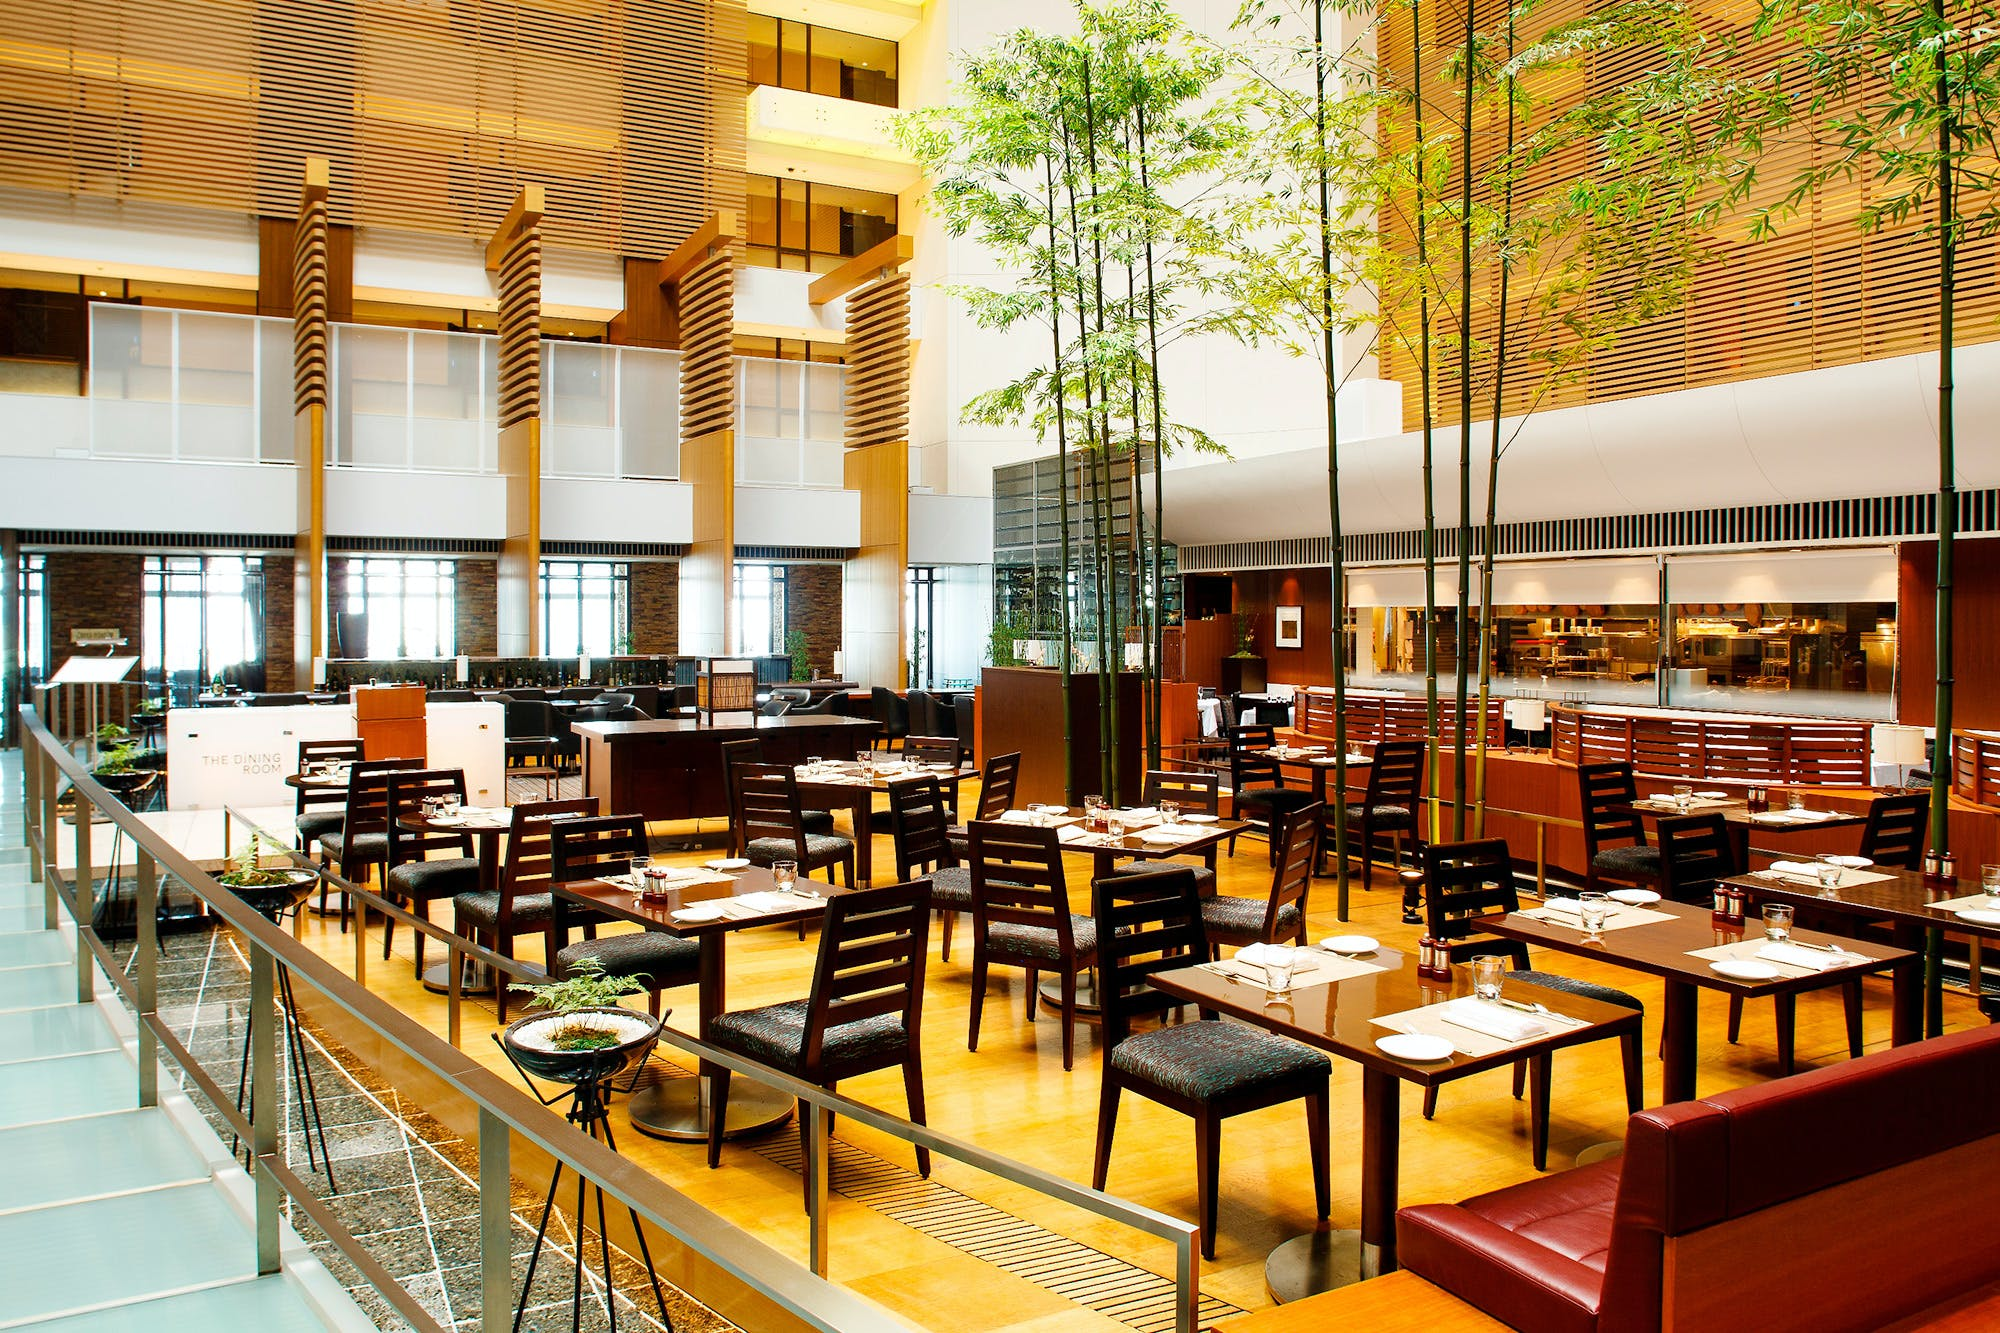 THE DINING ROOM/ ストリングスホテル東京インターコンチネンタル